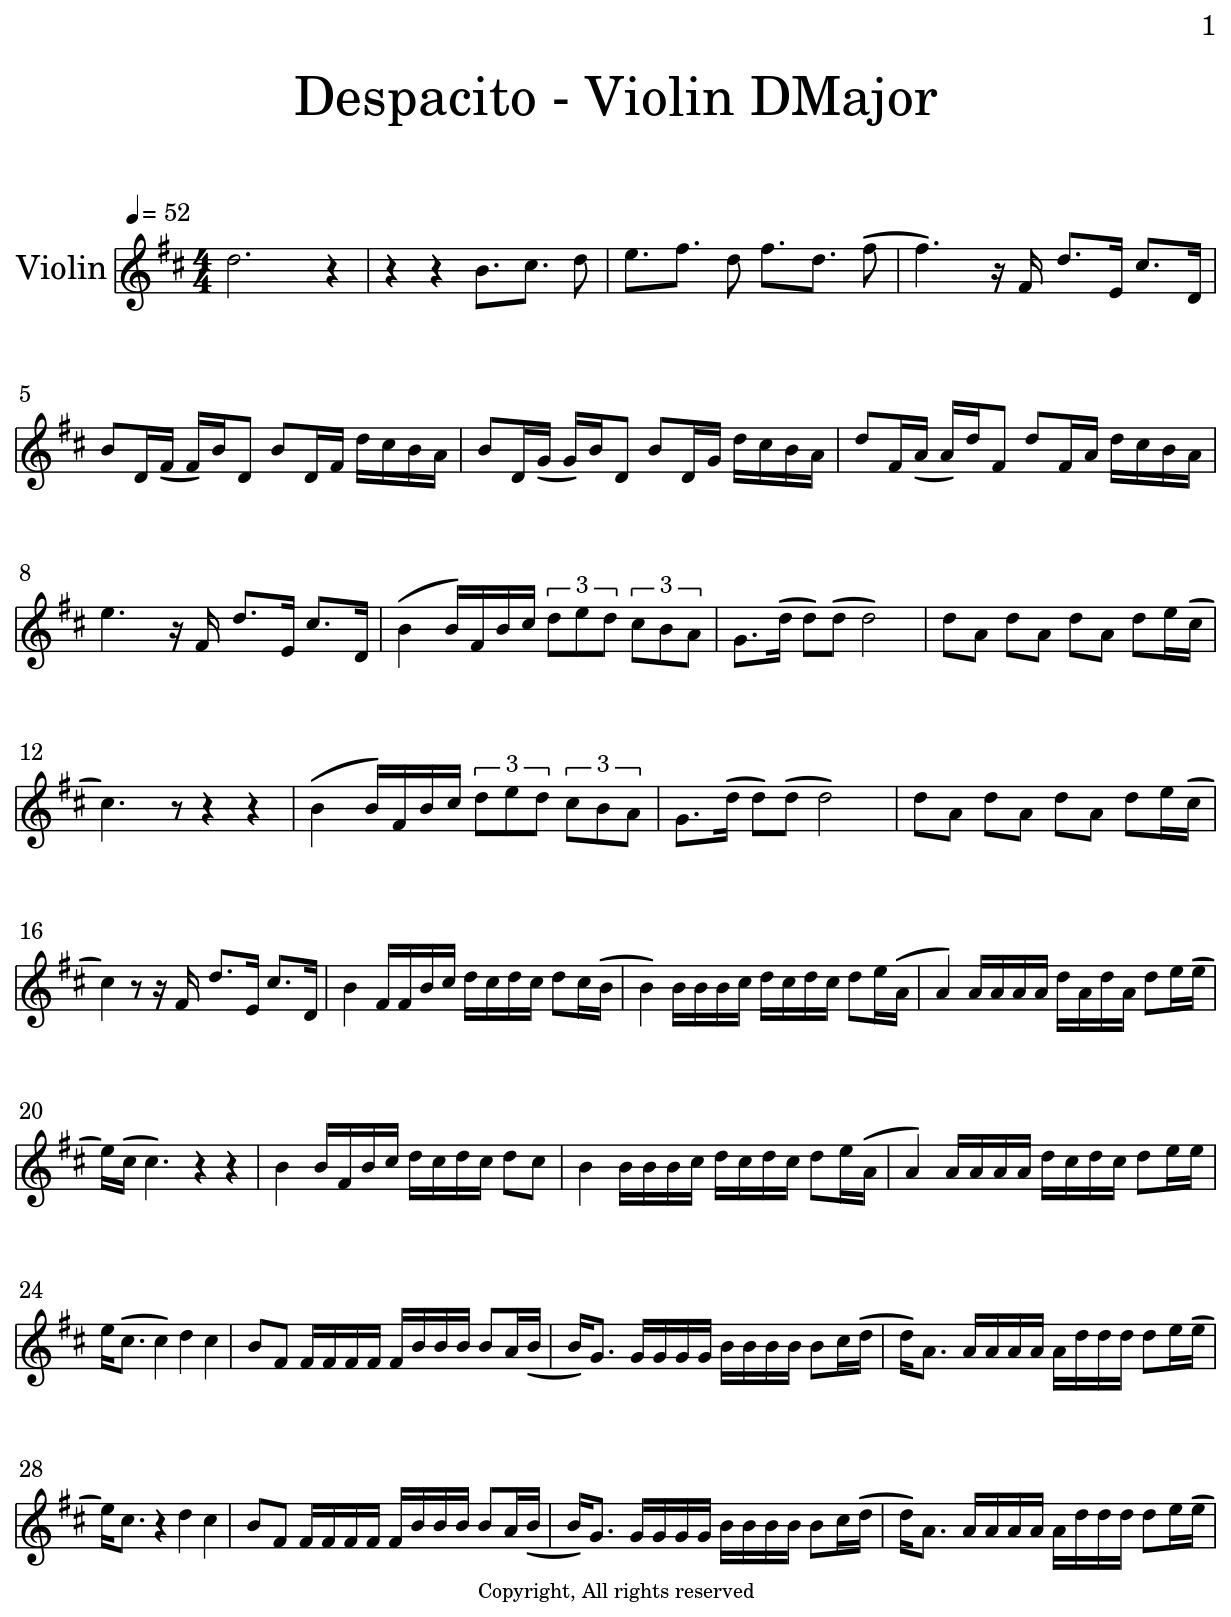 Despacito - Violin DMajor - Sheet music for Violin